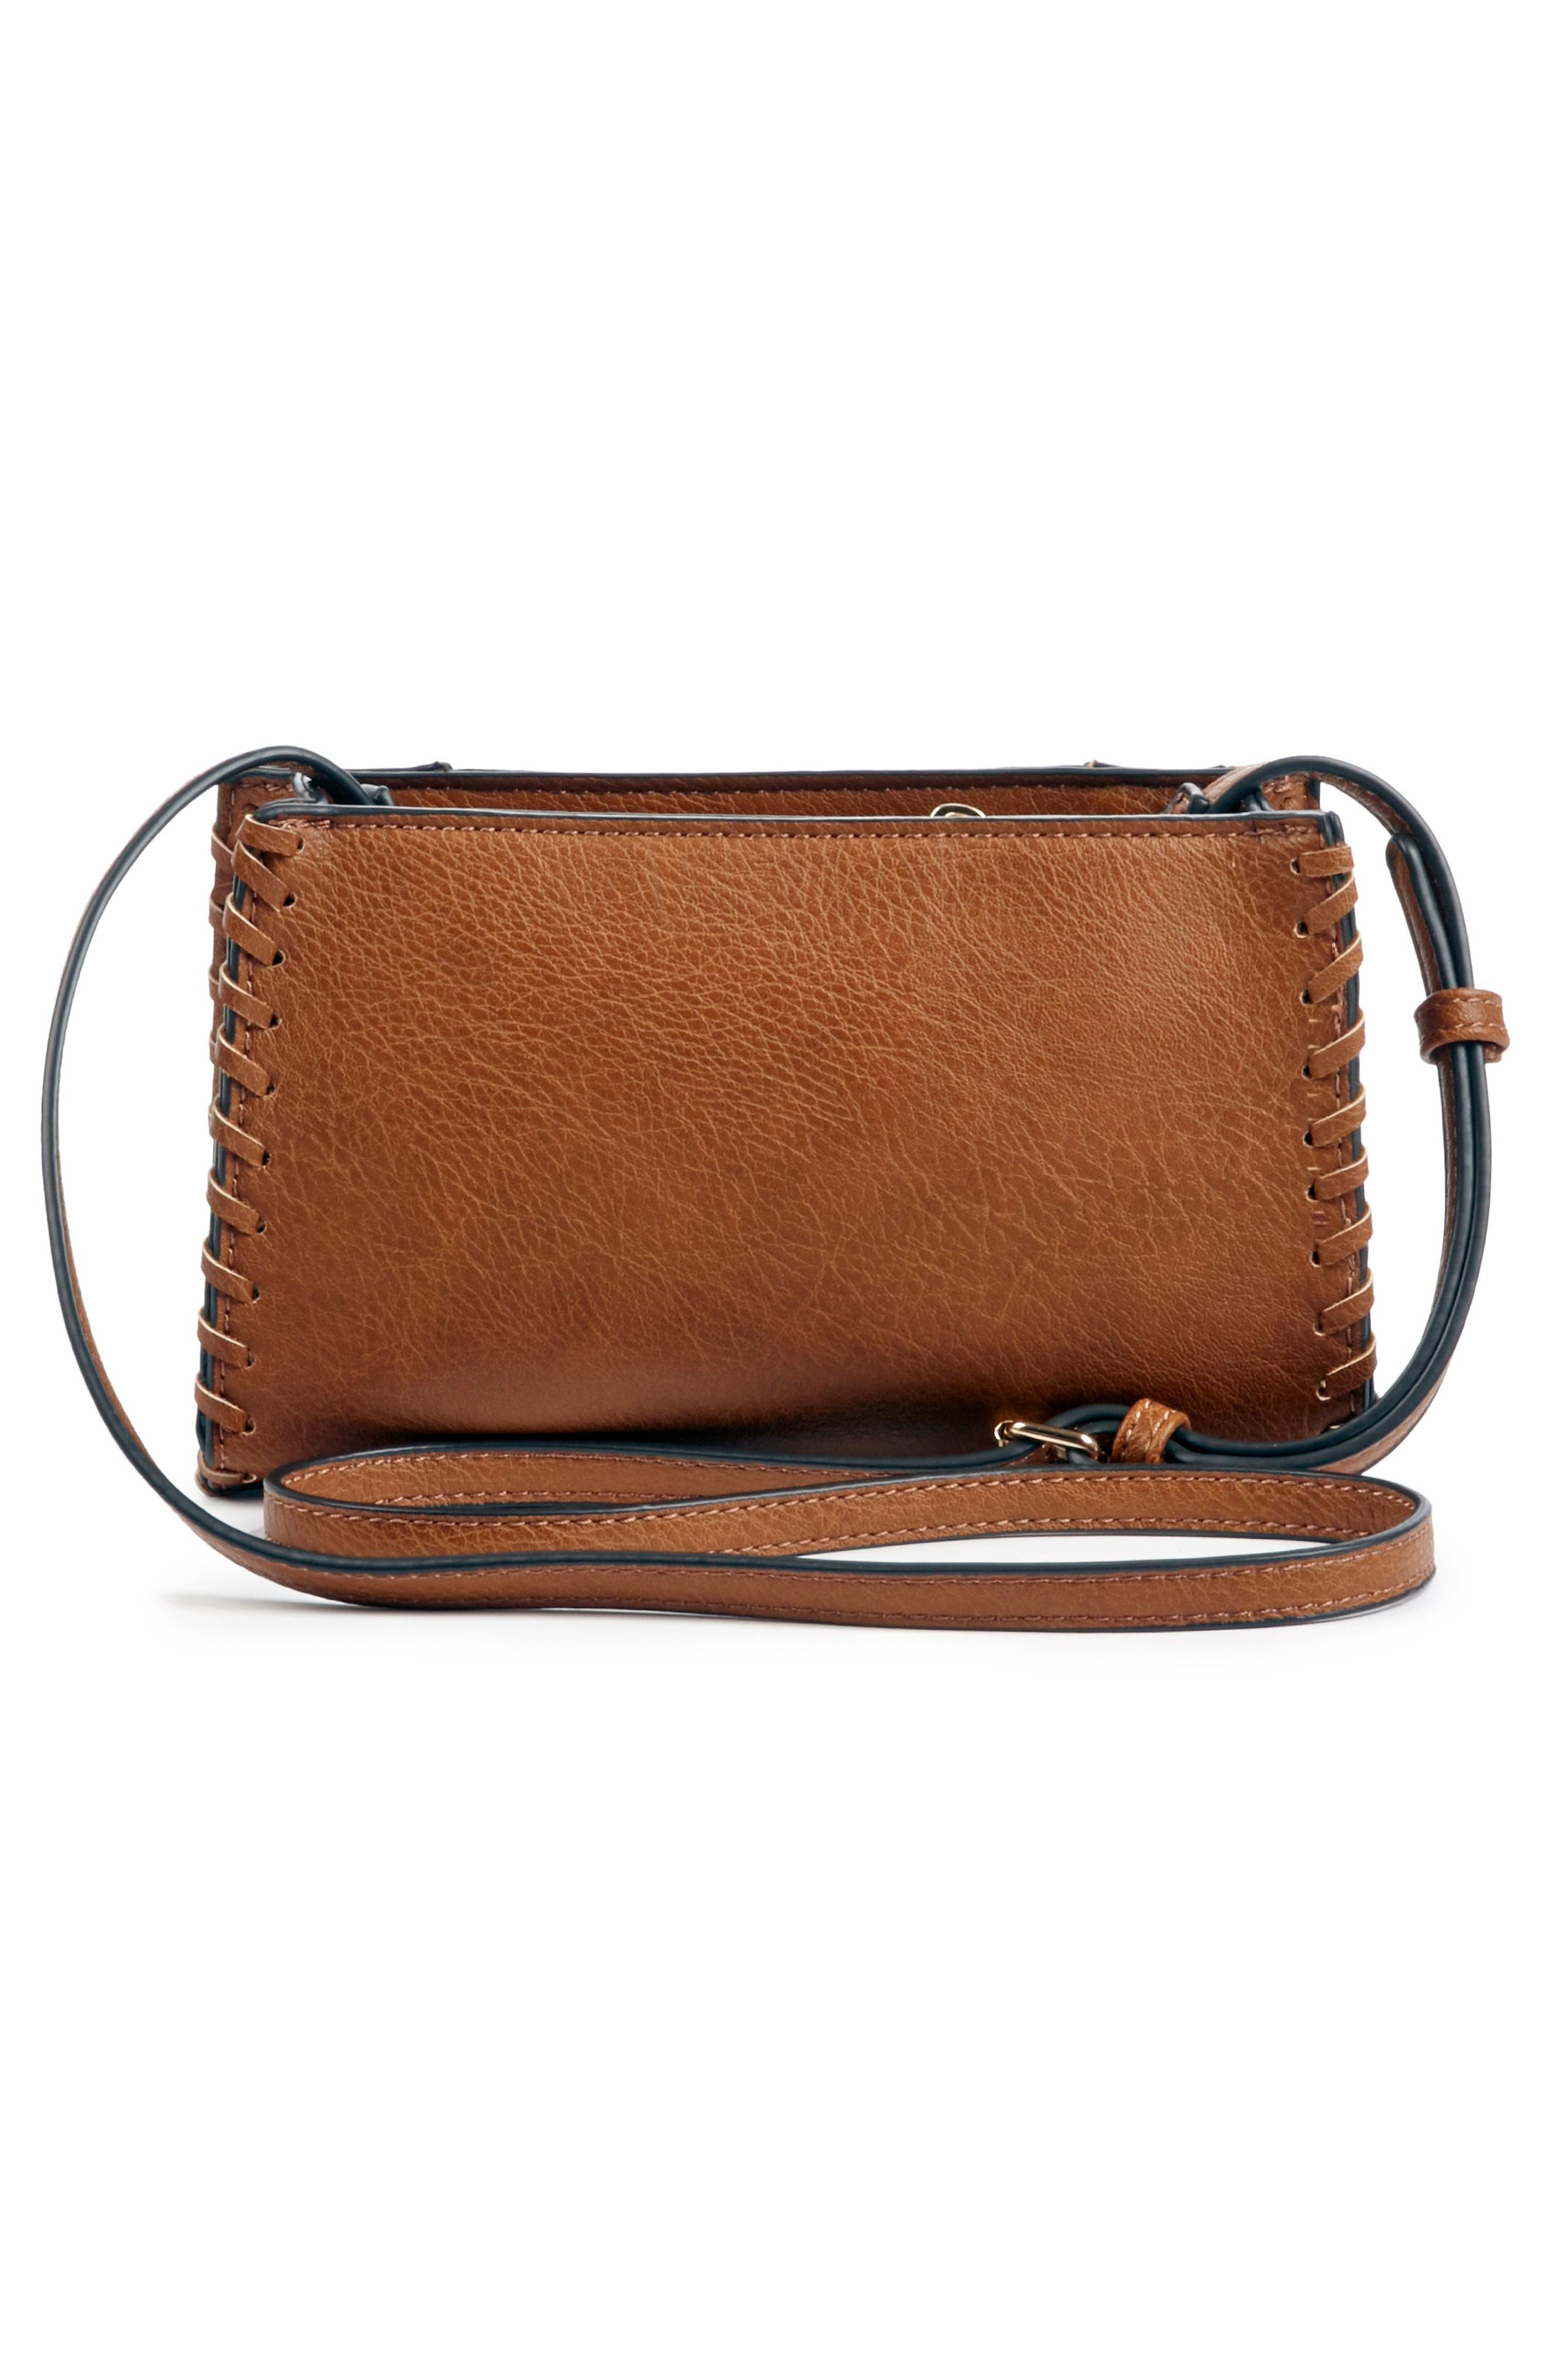 SOLE SOCIETY,                             Destin Faux Leather Crossbody Bag,                             Alternate thumbnail 2, color,                             230